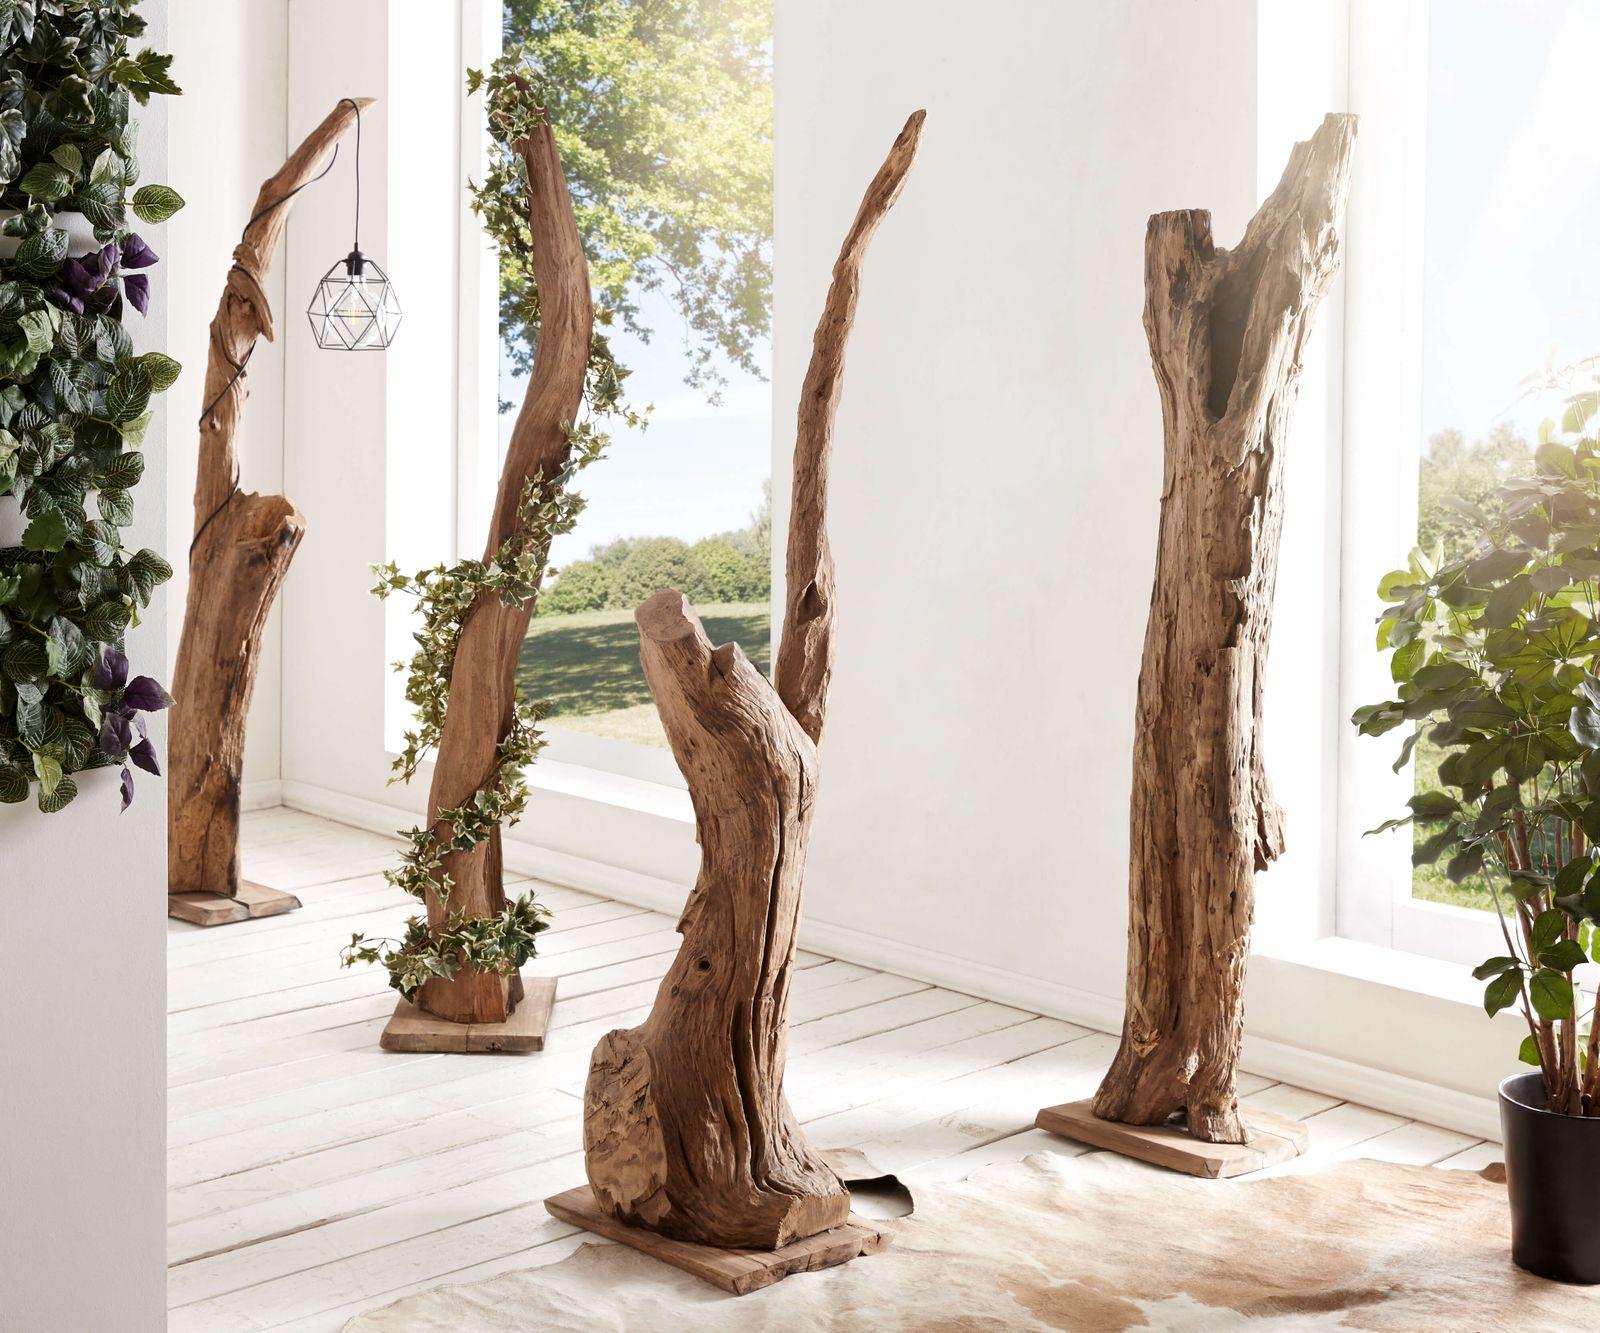 delife-dekoration-raiz-160-190-cm-teakholz-natur-wurzel-unikat-massiv-dekoartikel